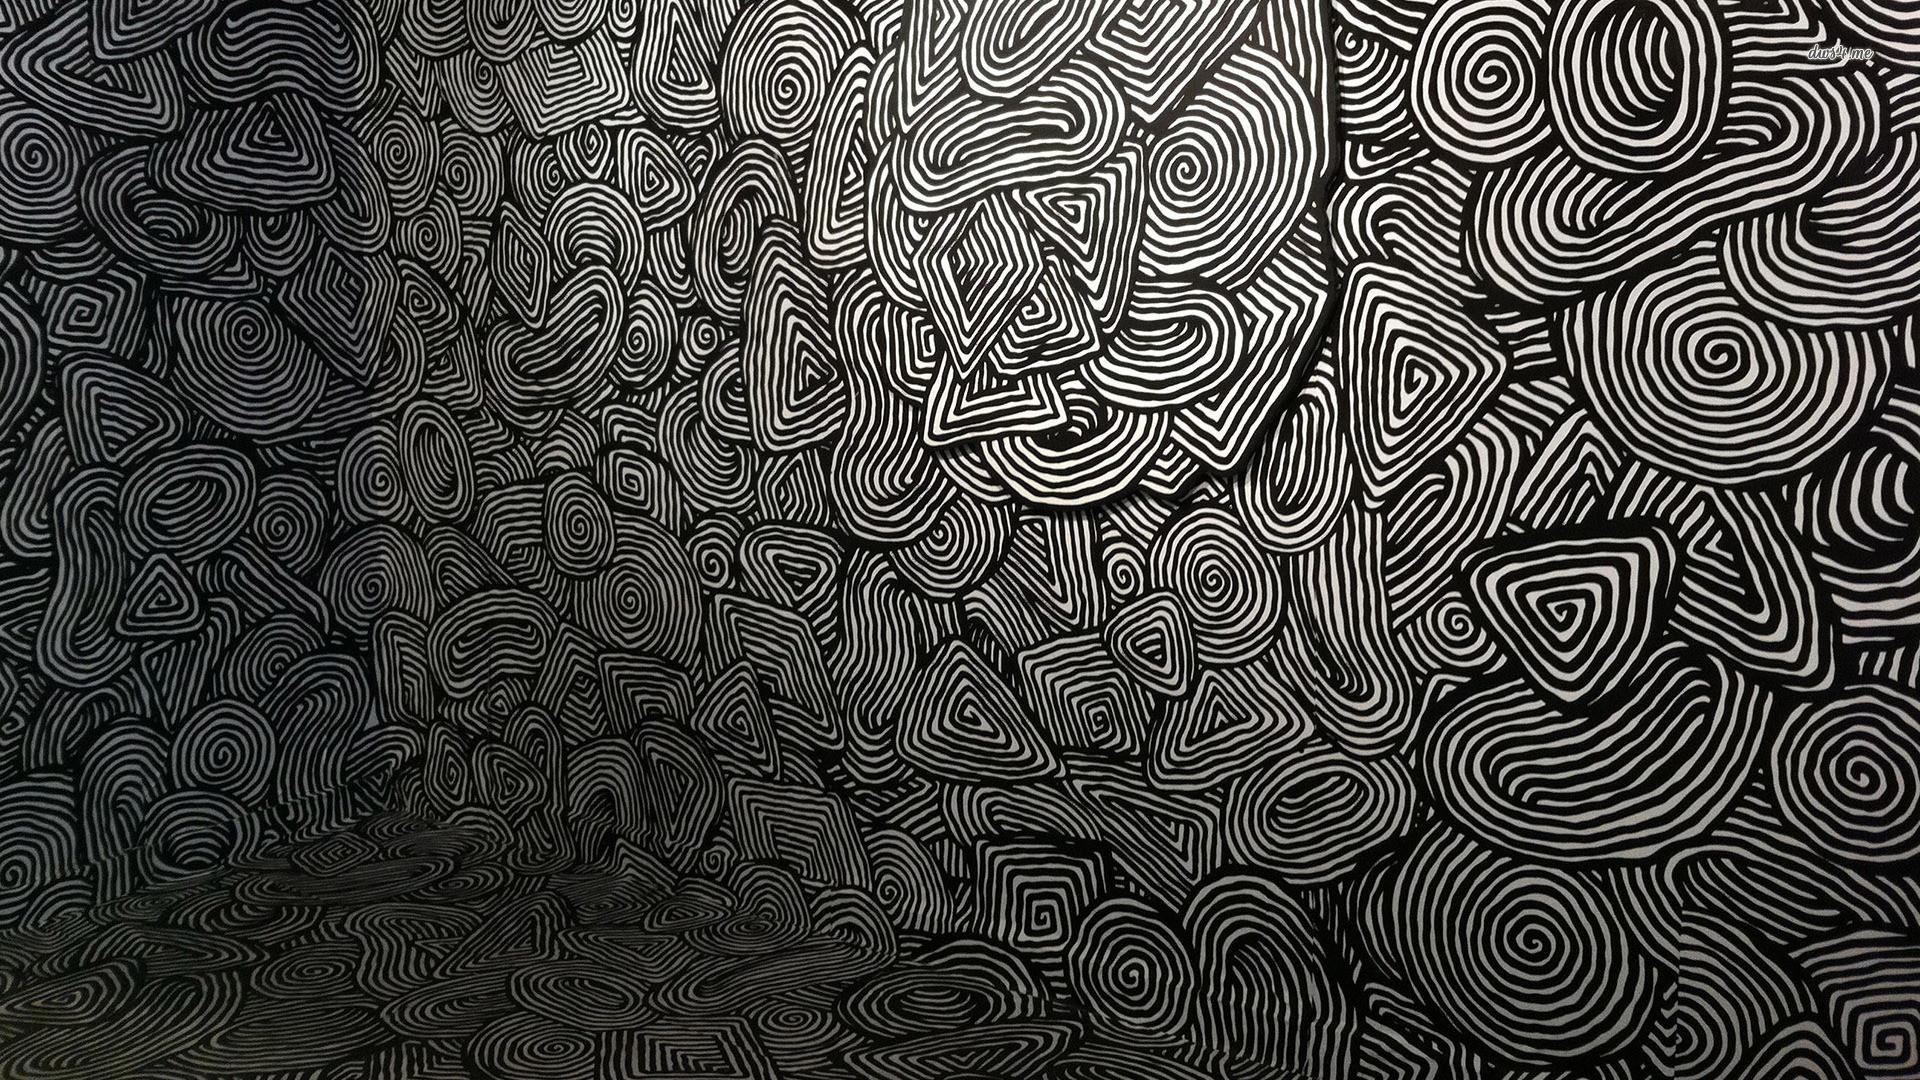 Psychedelic Desktop Backgrounds 1920x1080